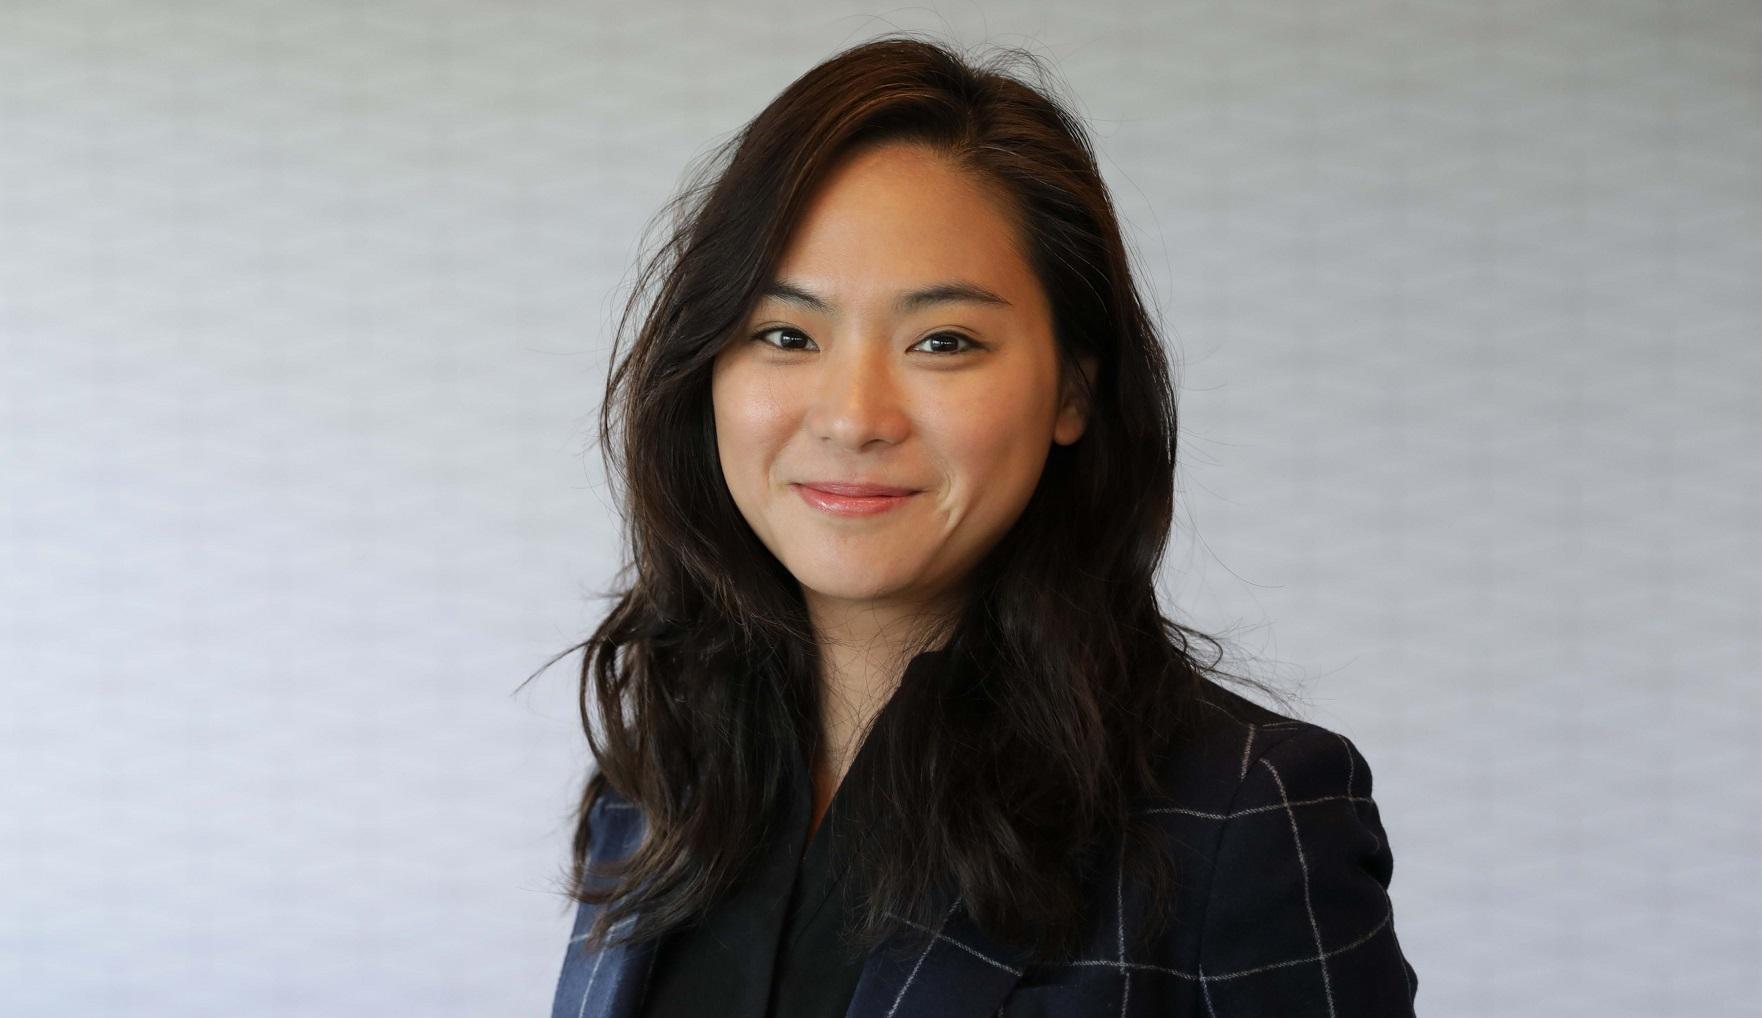 Anna Chung, Principal Researcher at Unit 42, Palo Alto Networks